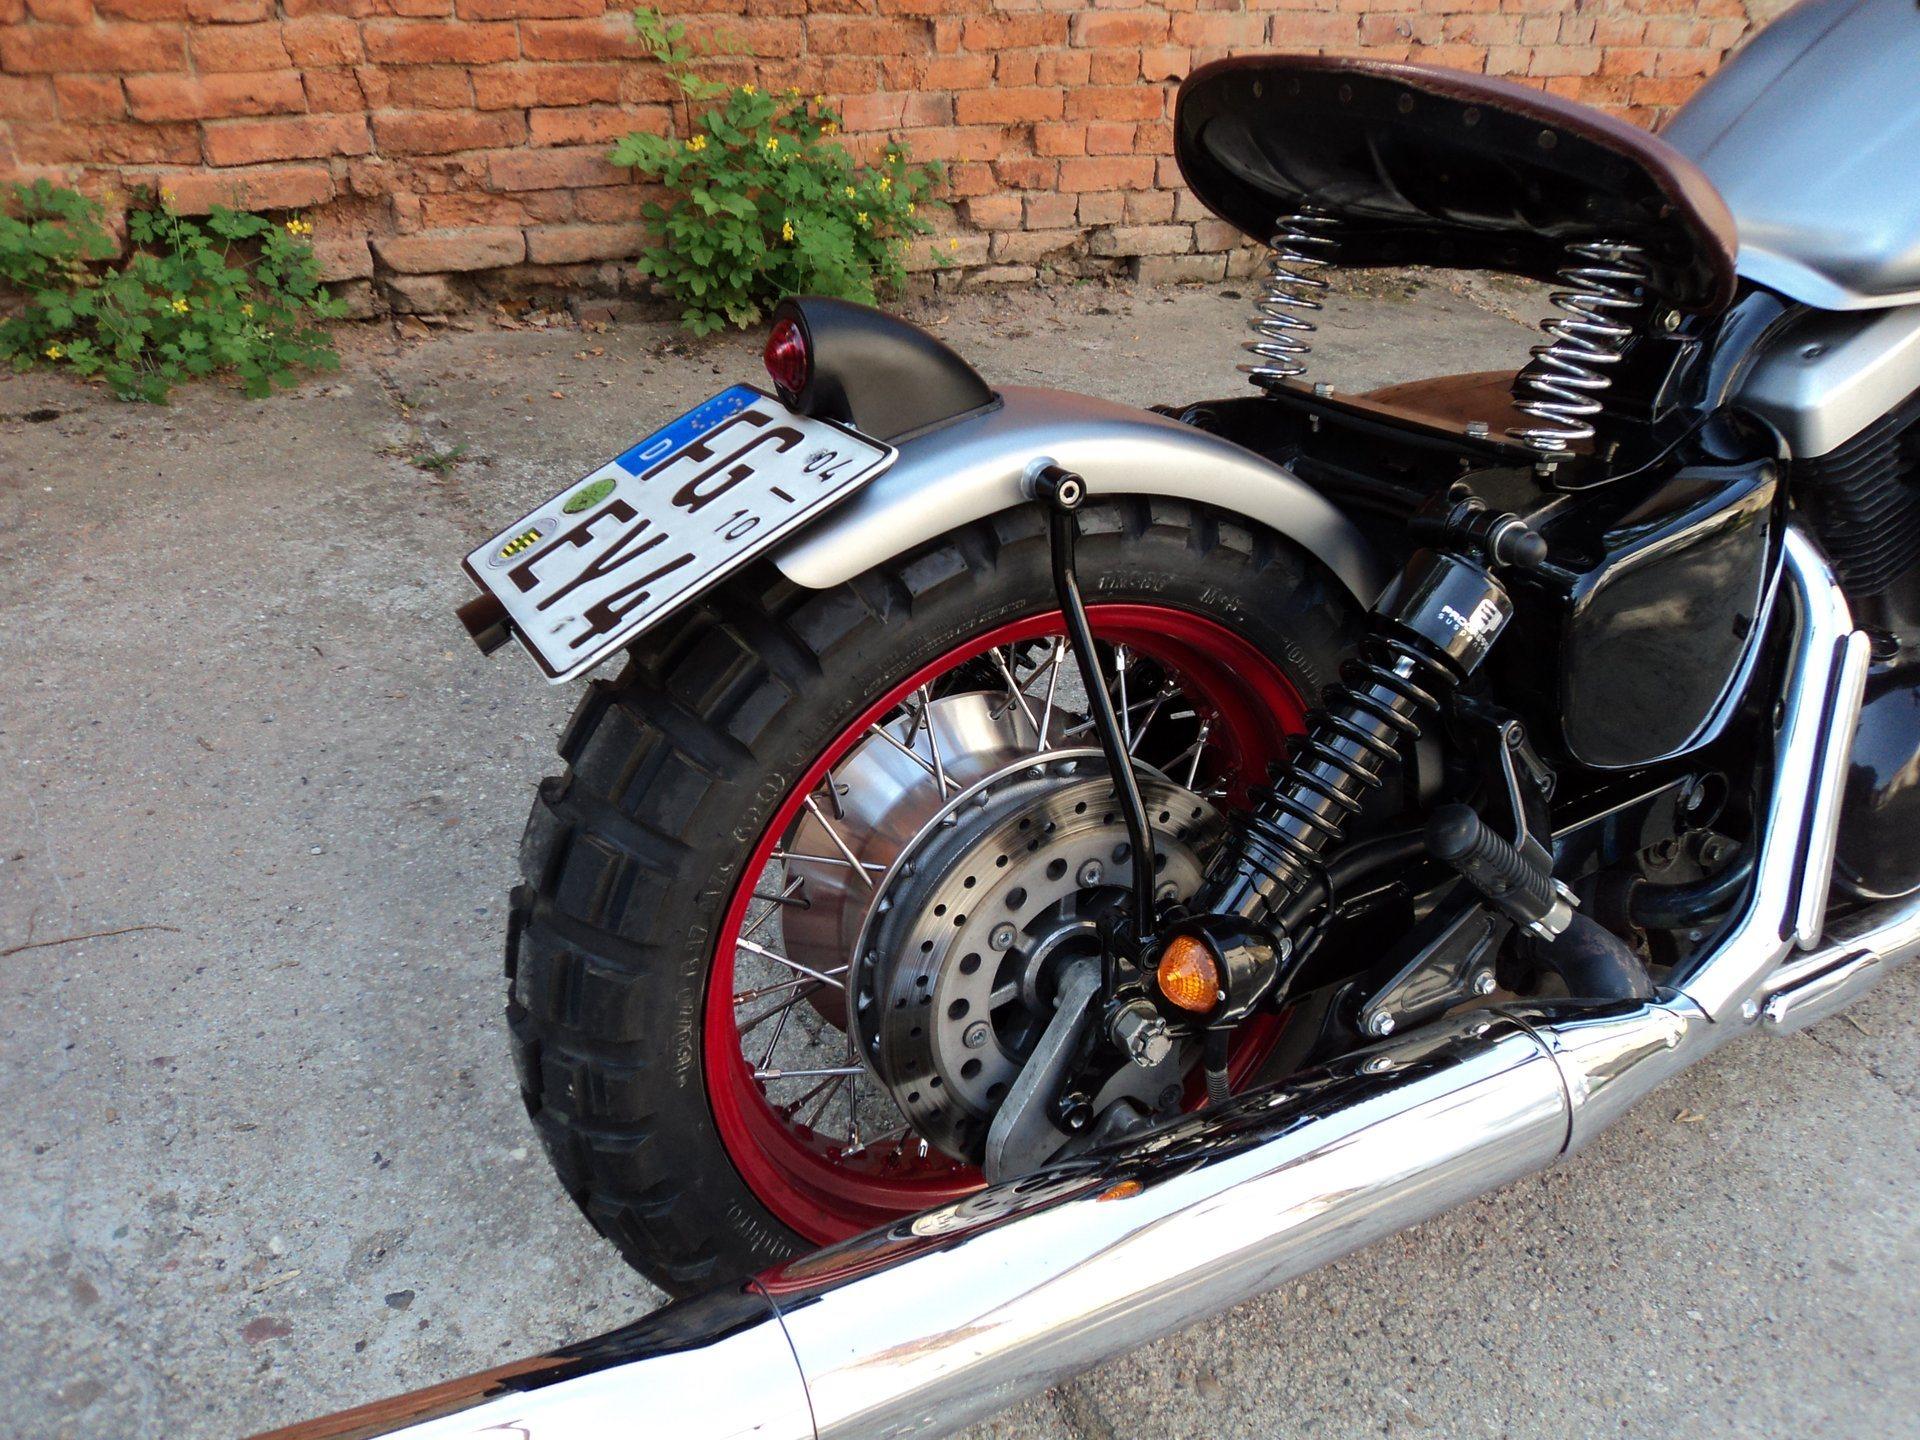 Umgebautes Motorrad Kawasaki D Tracker 125 Von Wild East Motorcycles New Inh Dirk Leuteritz